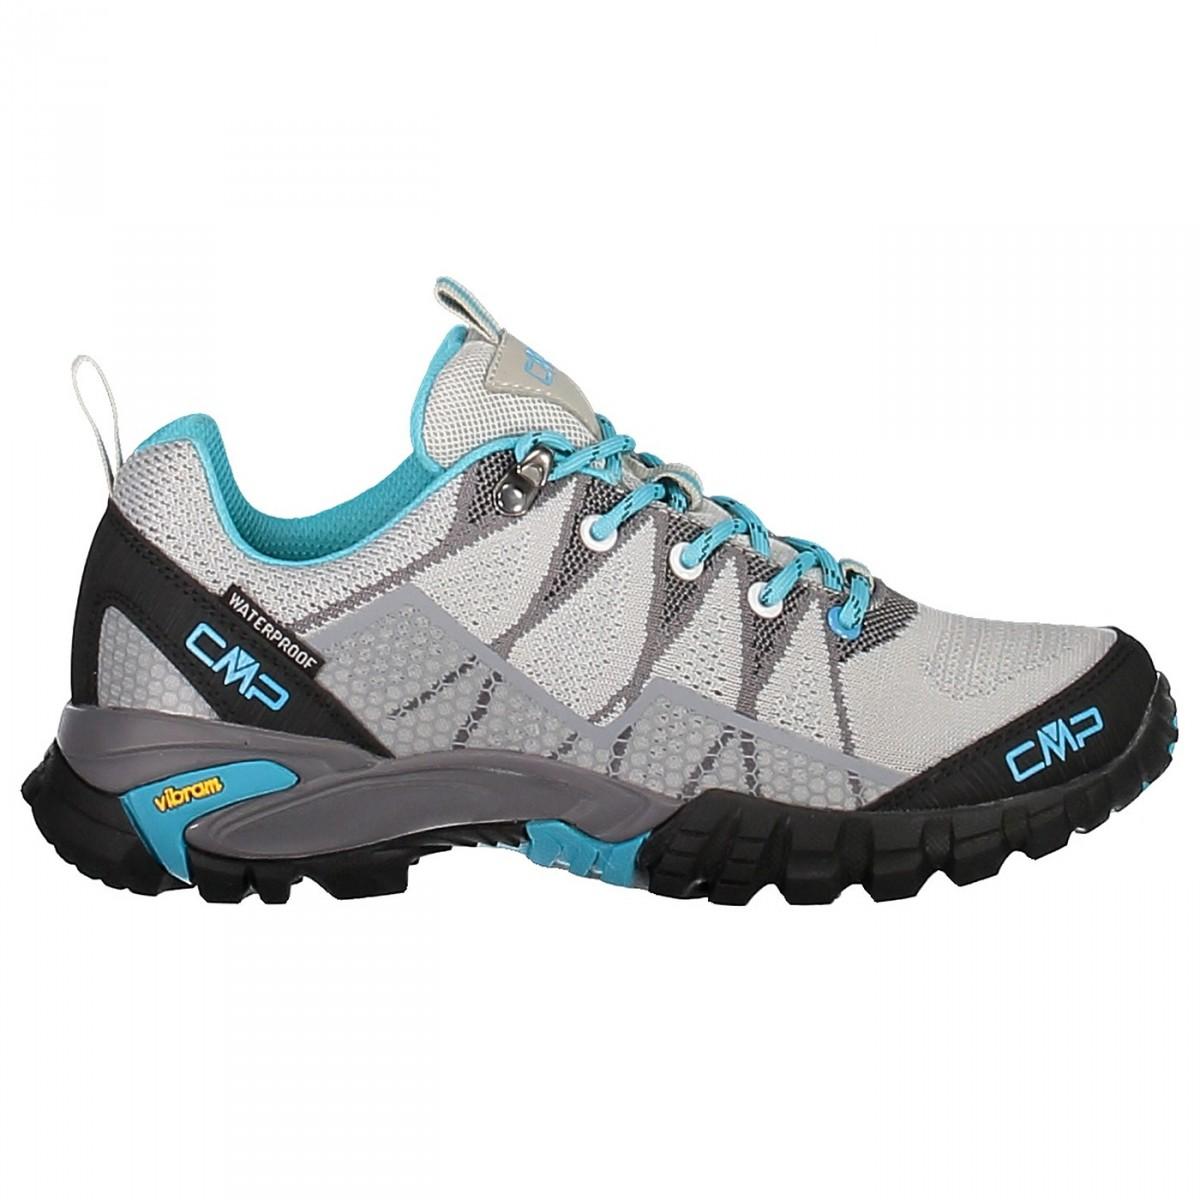 chaussure cmp tauri low femme chaussures montagne et trekking. Black Bedroom Furniture Sets. Home Design Ideas